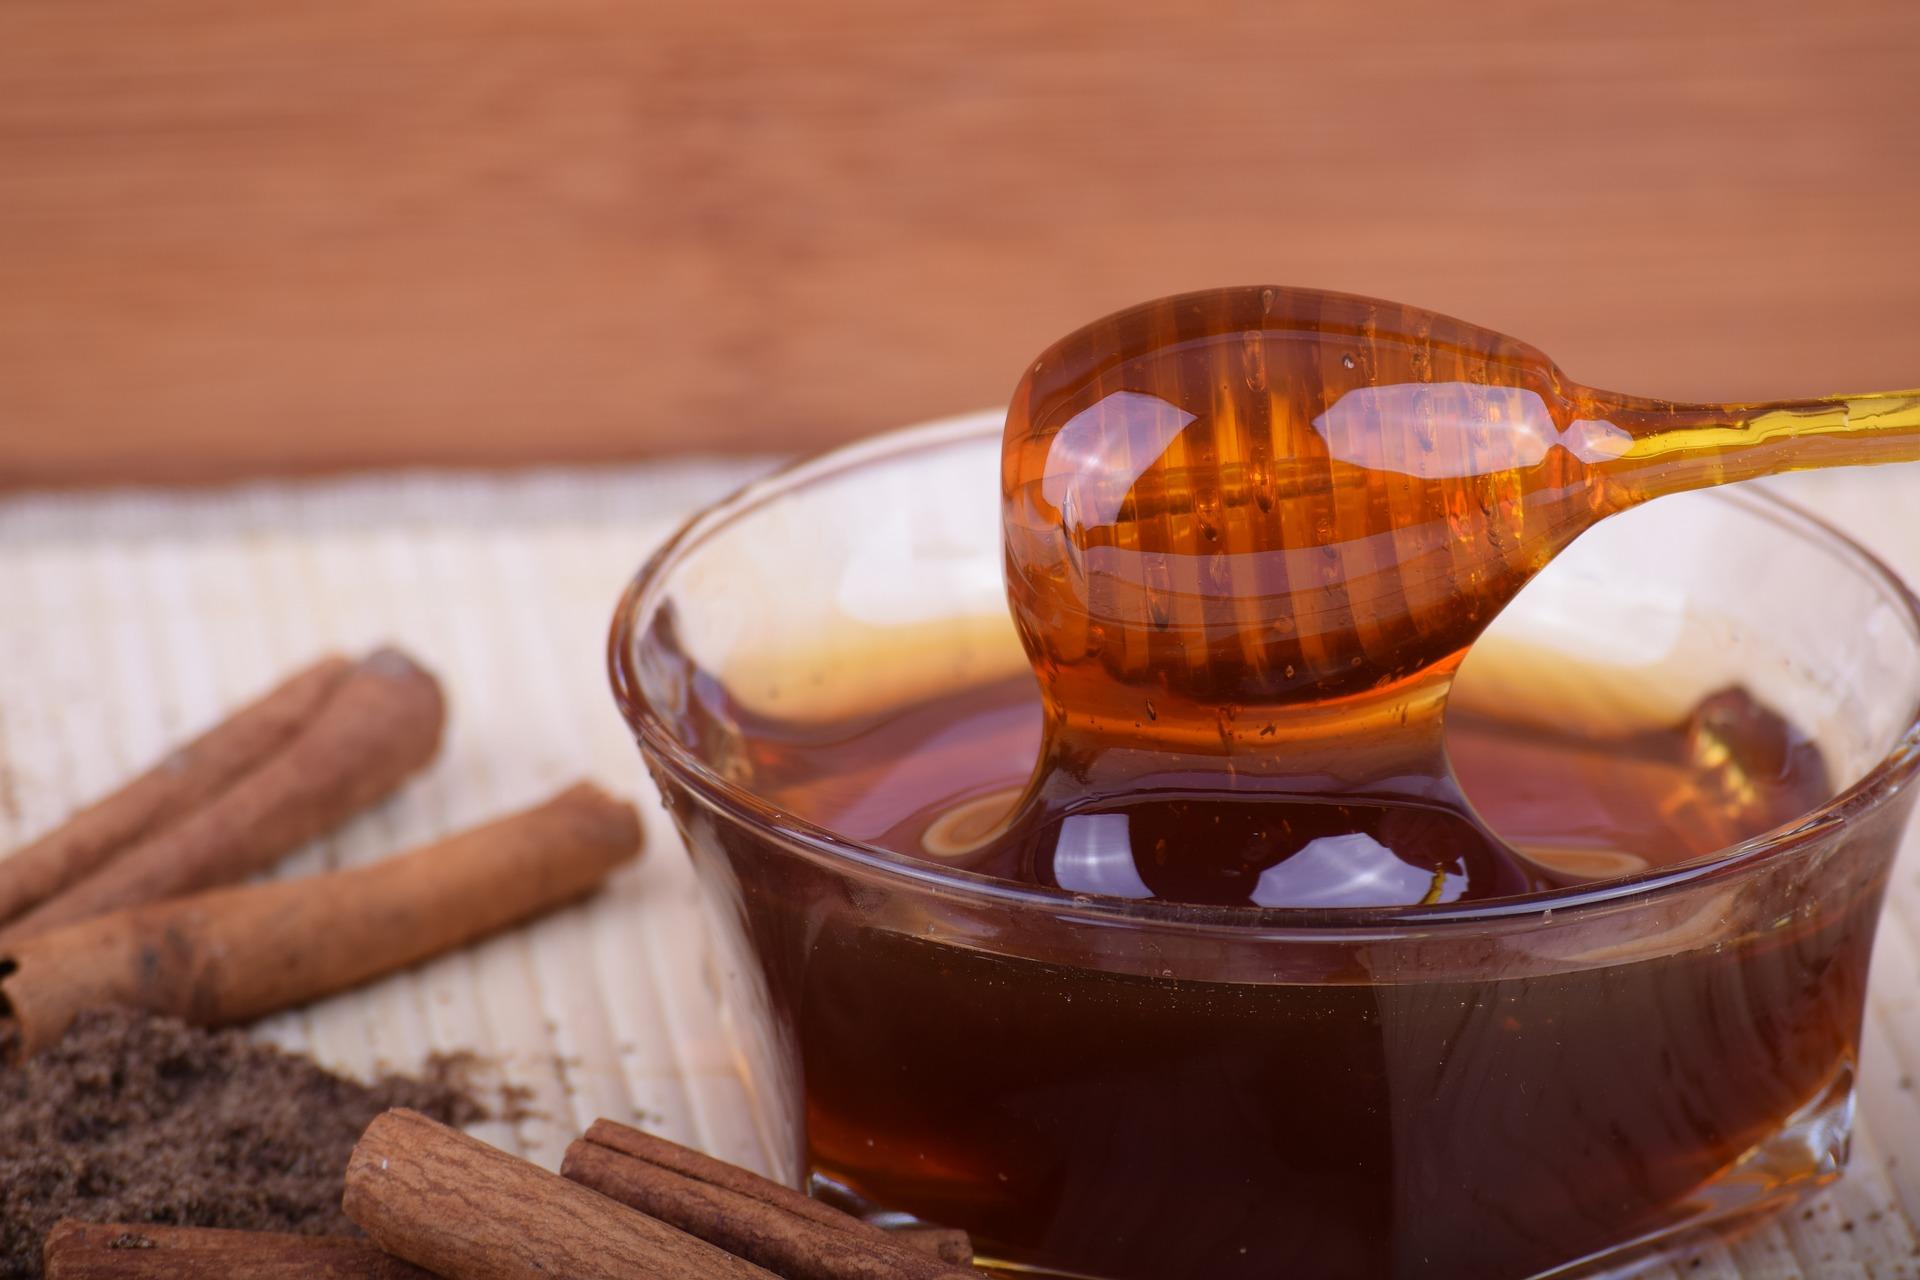 Miel con canela, un potente remedio natural